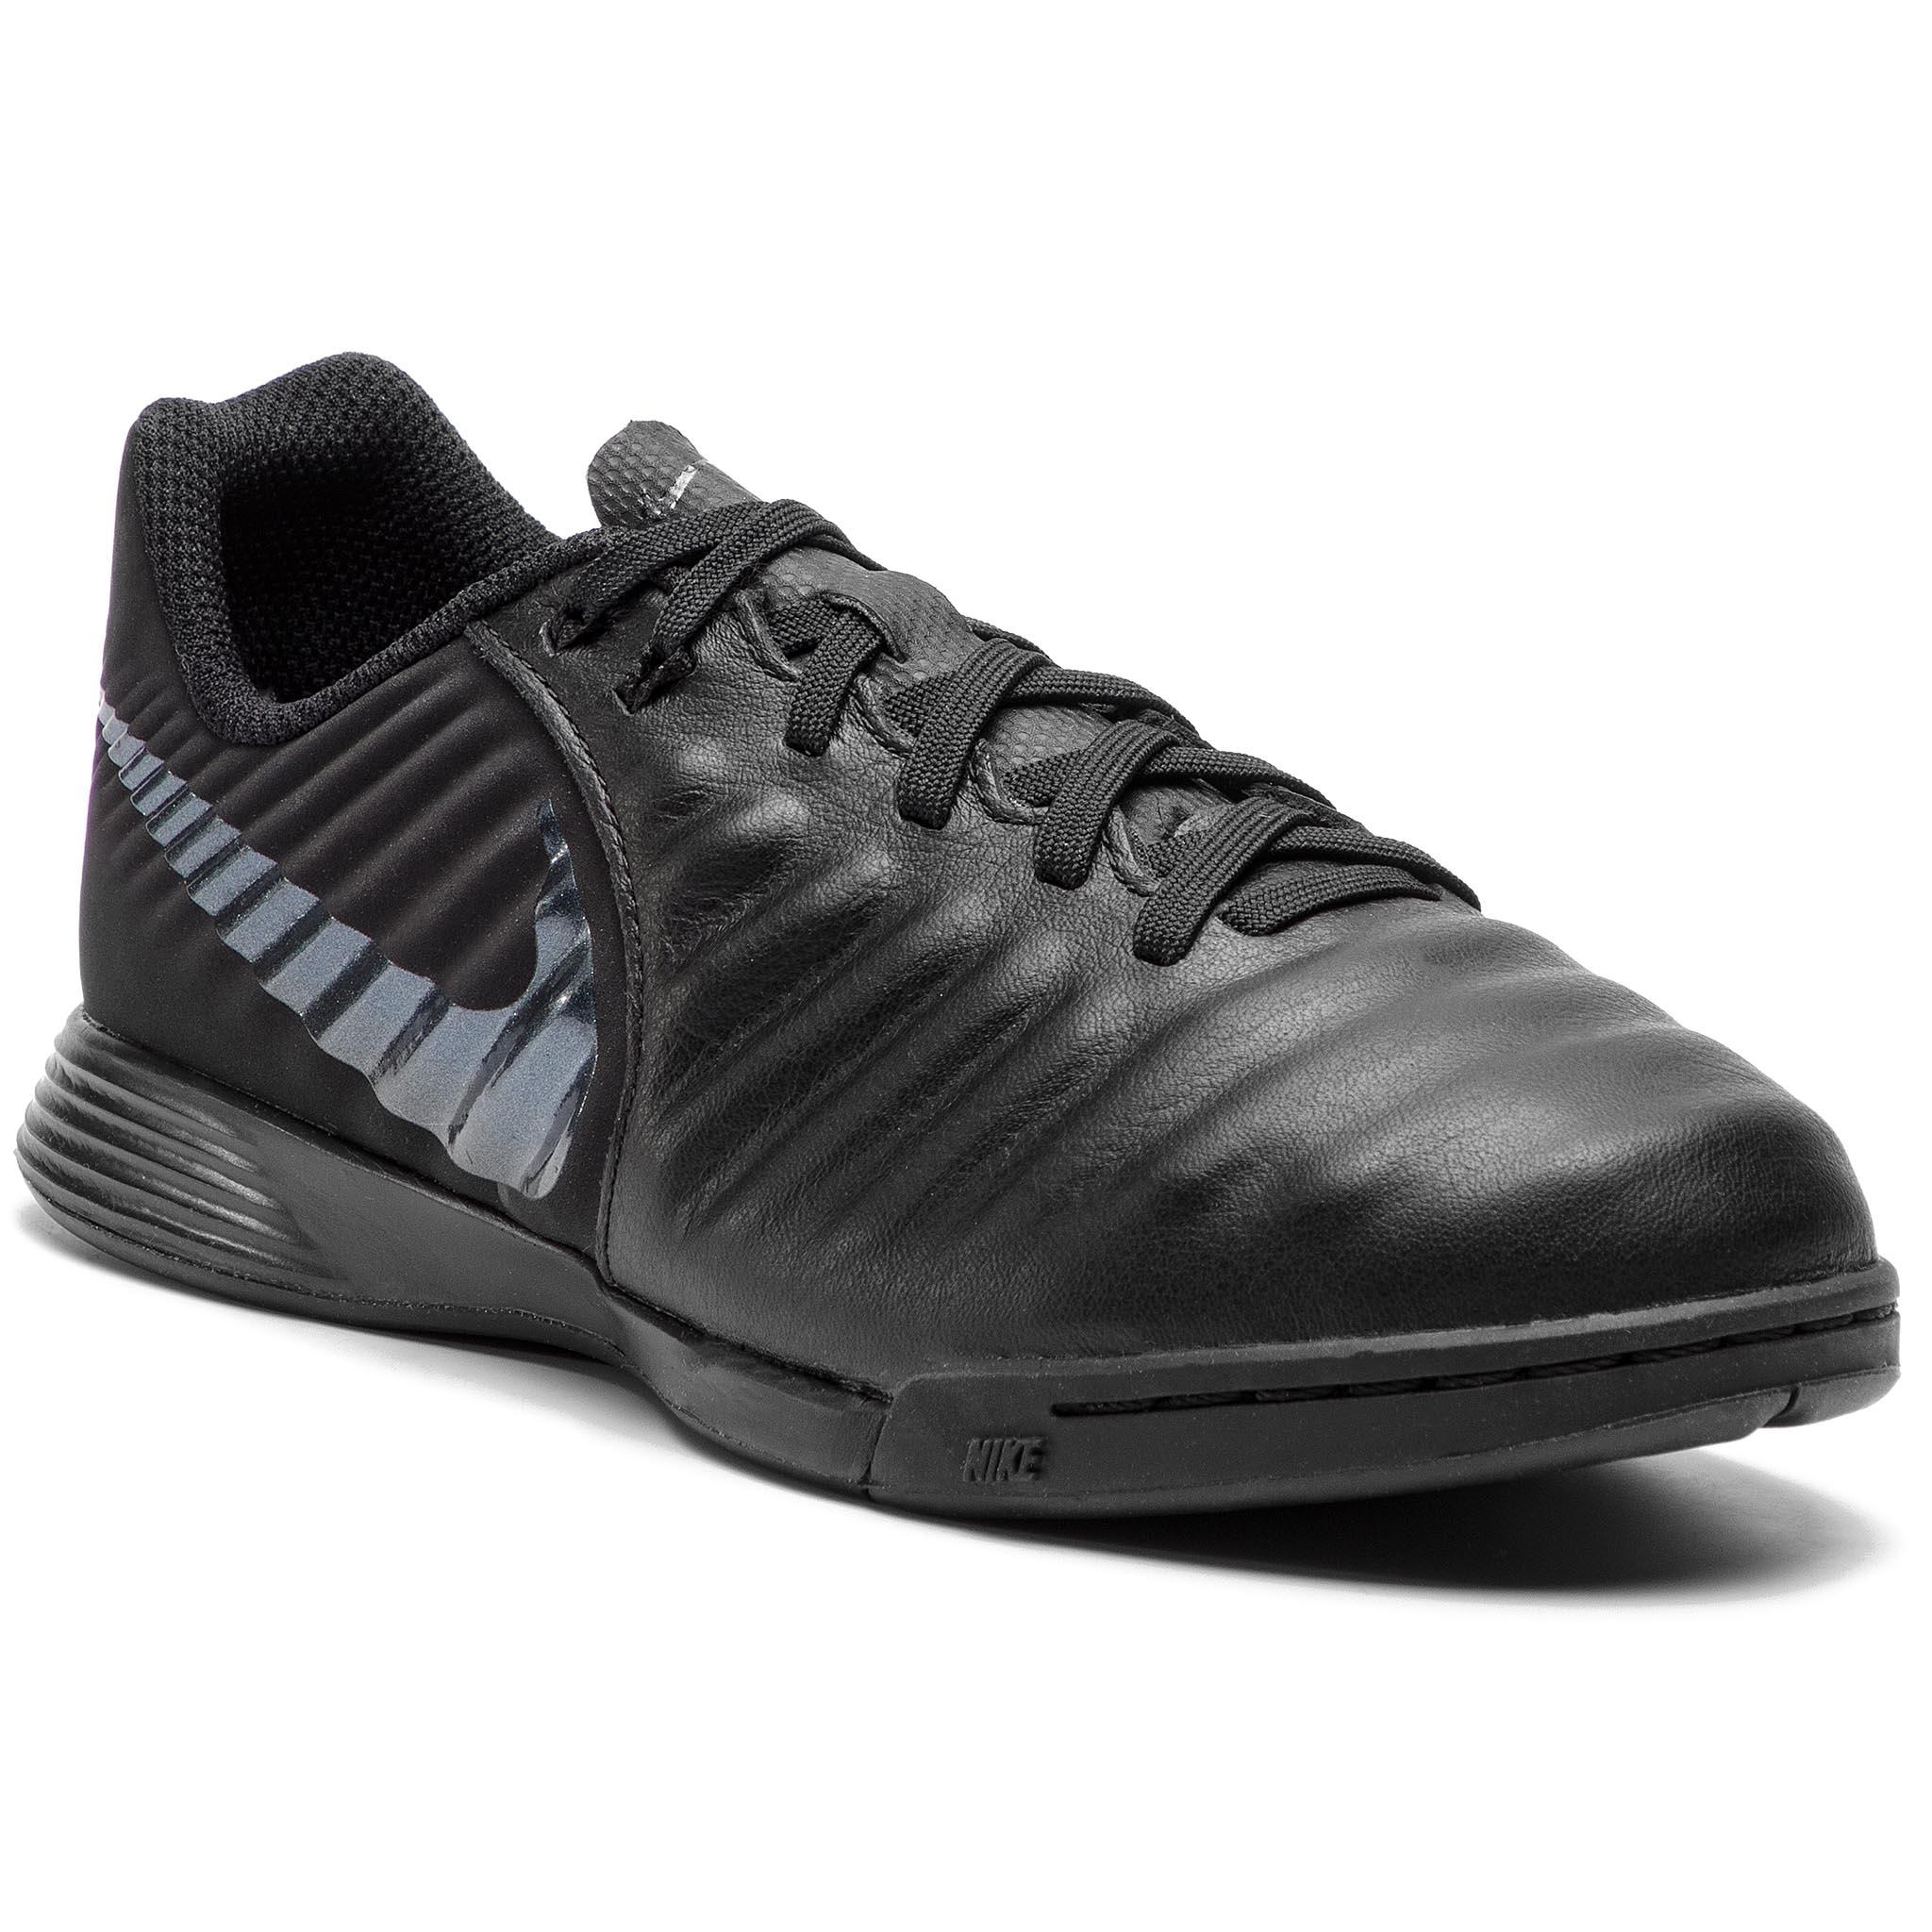 Cipő NIKE - Jr Legend 7 Academy Ic AH7257 001 Black Black. Új Cipő NIKE ... 02808c36eb